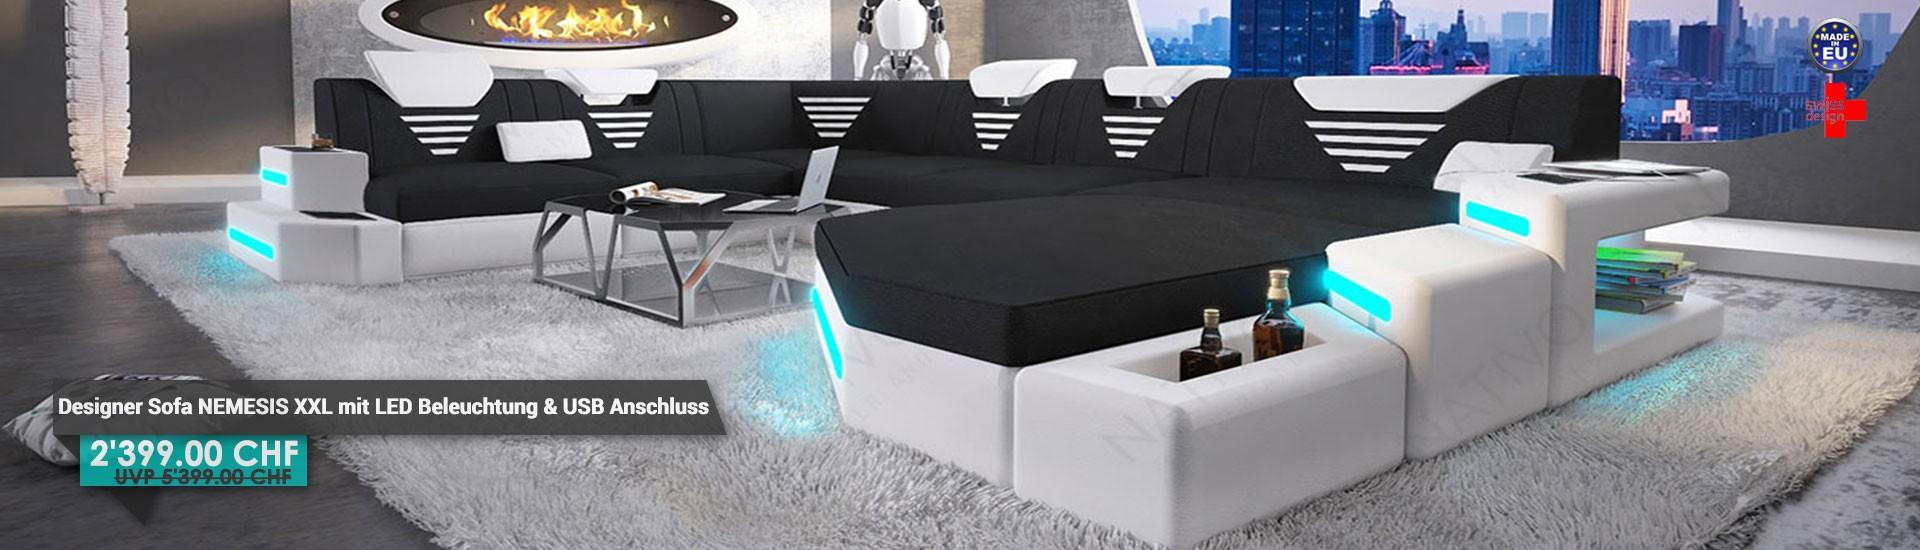 NATIVO magasin de meuble design. Achetez canape d\'angle ...